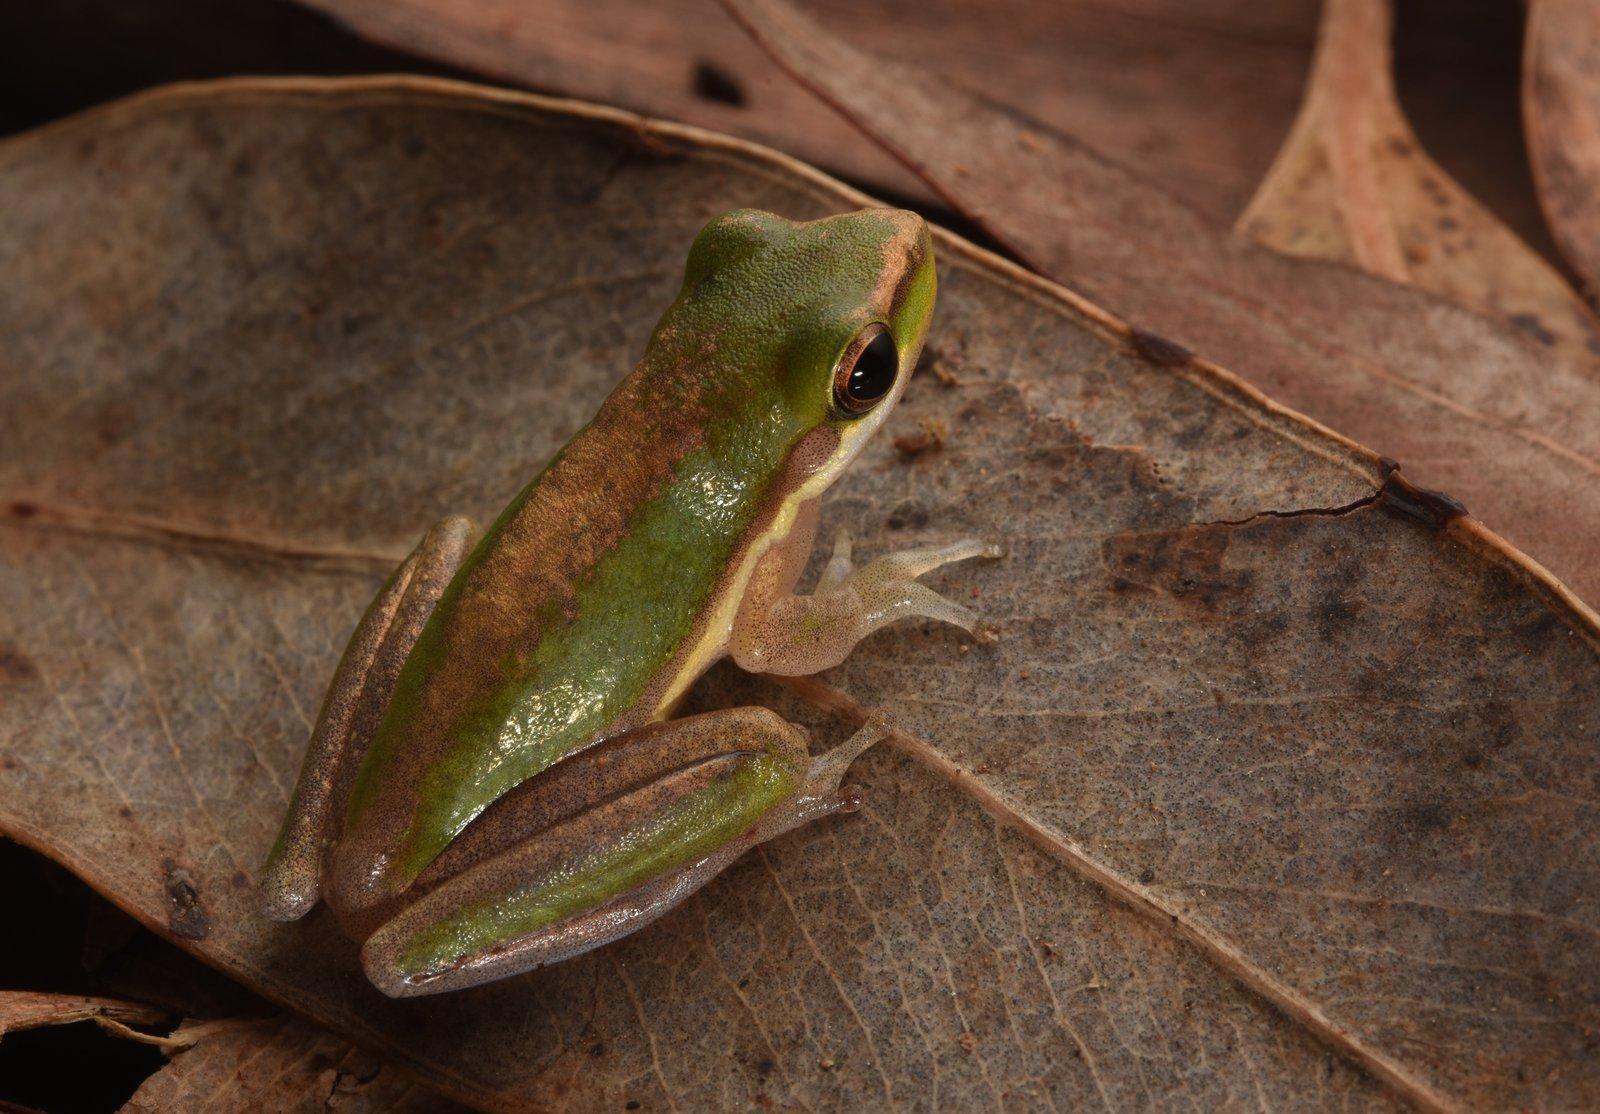 Northern Sedge Frog (Litoria bicolor) Anindilyakwa Language Name – Dilyaburnda.